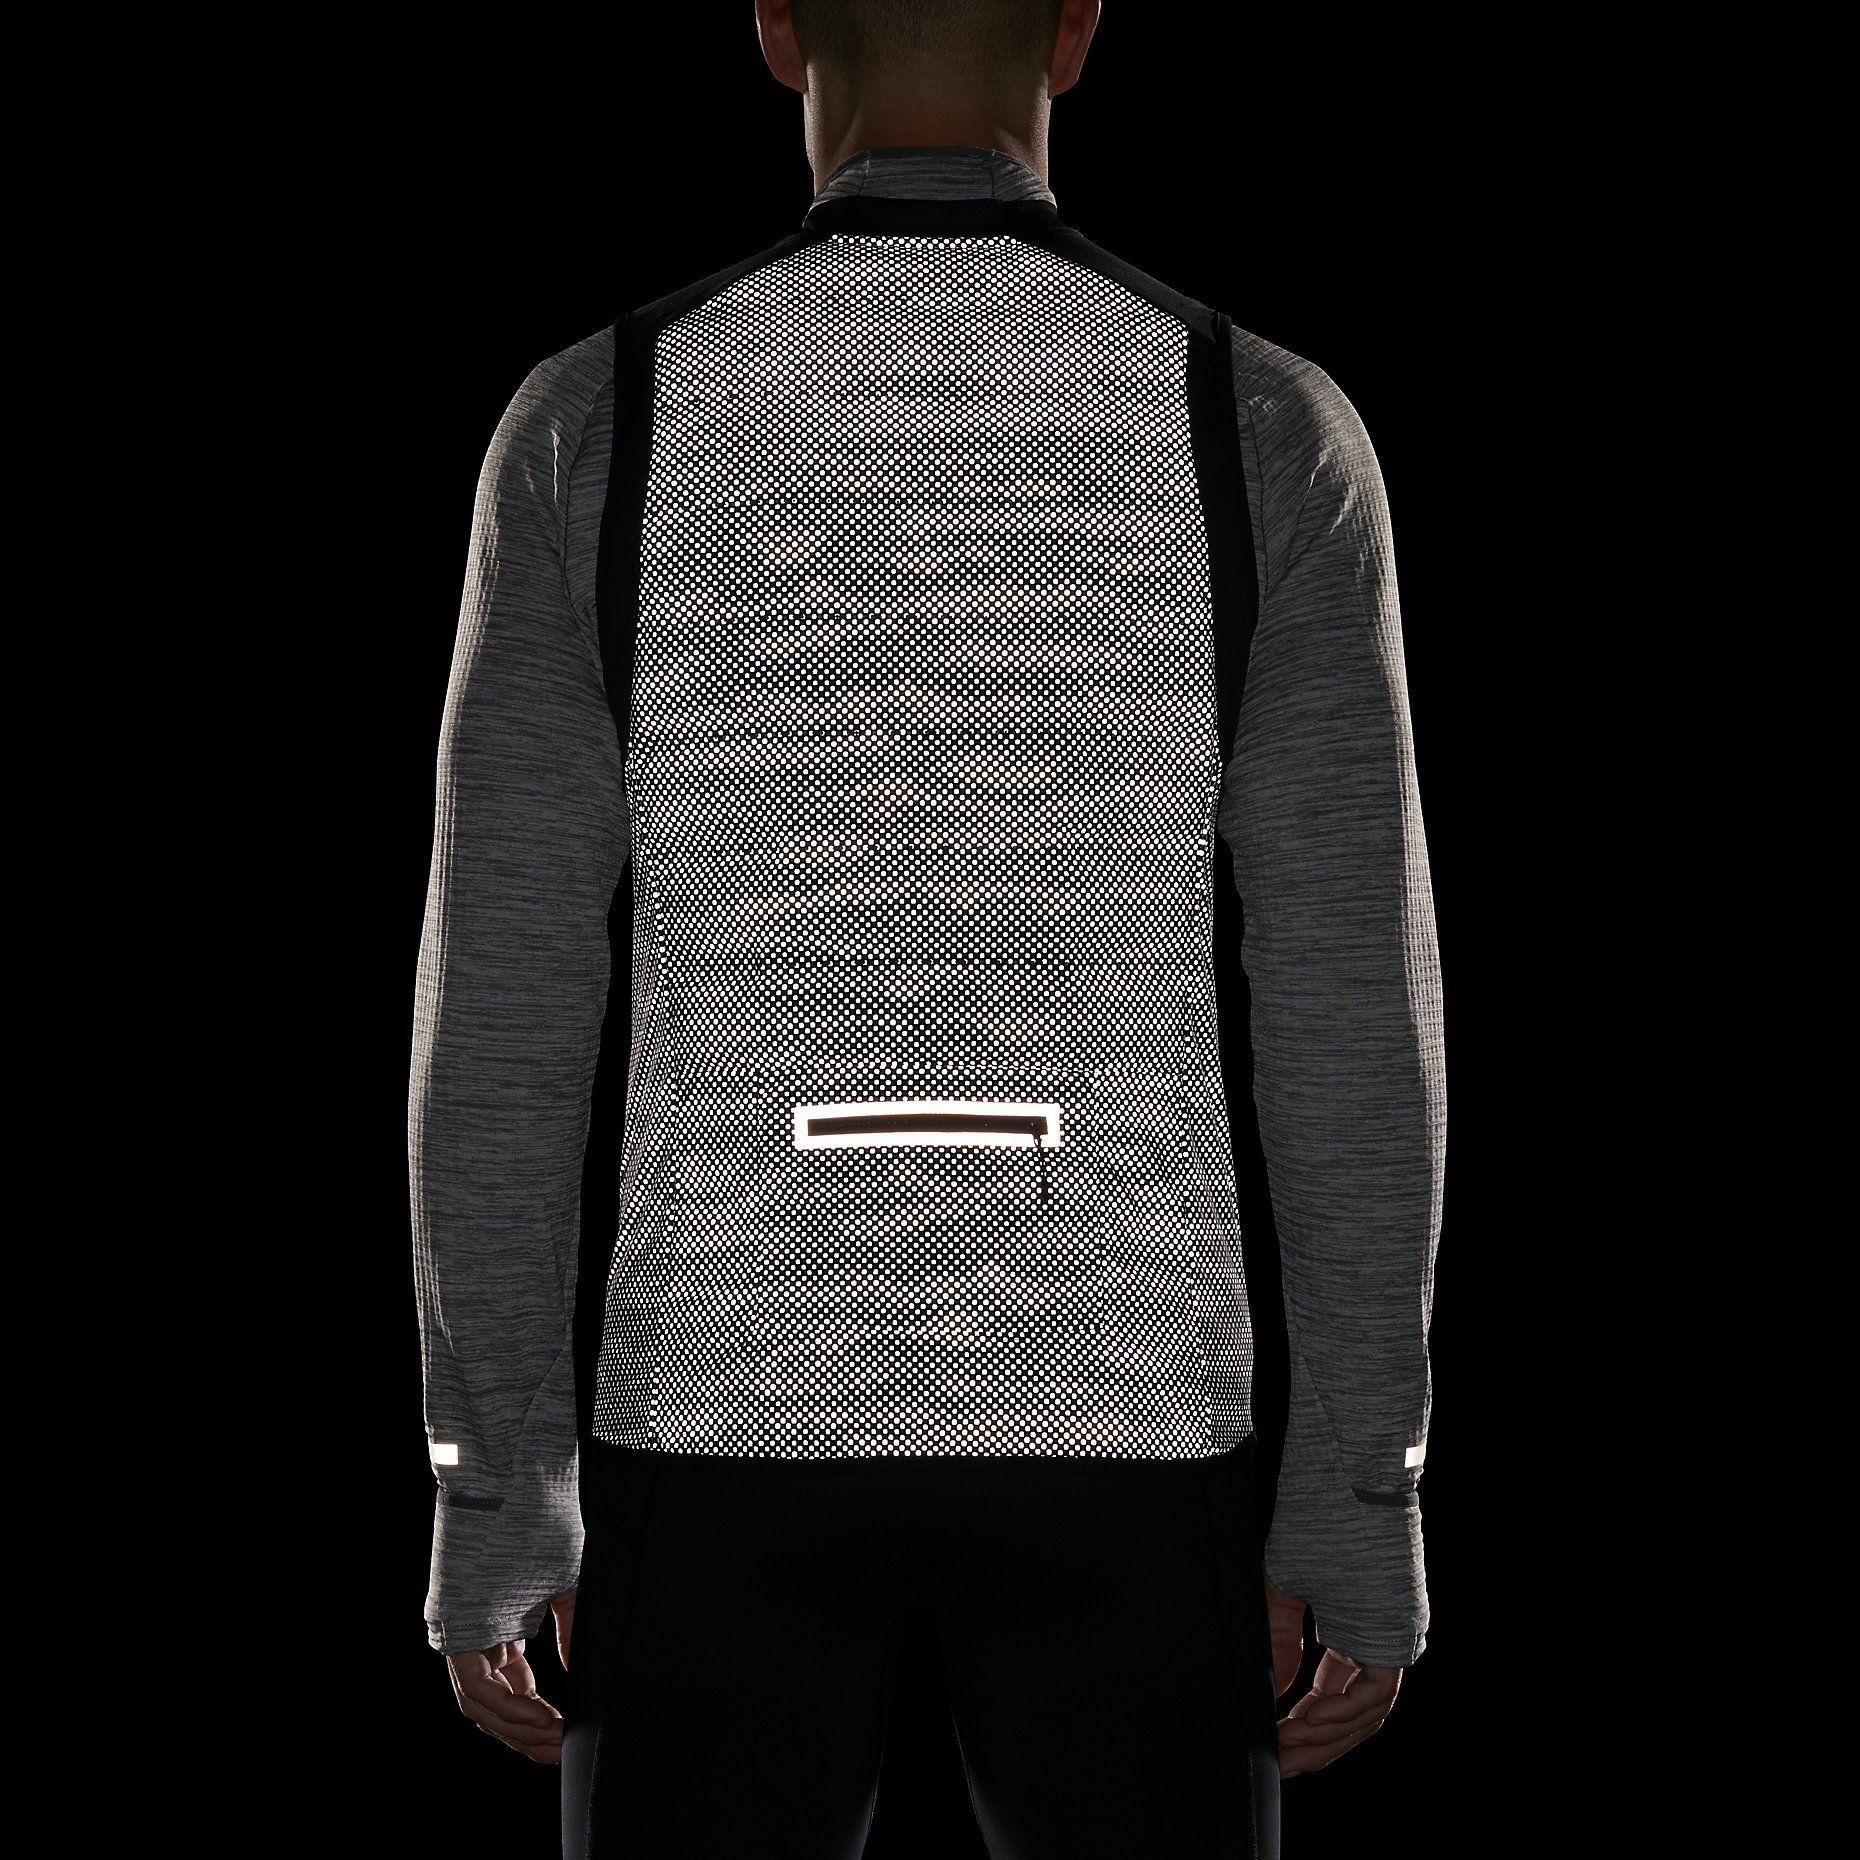 Nike Aeroloft Flash Men's Running Vest. (UK